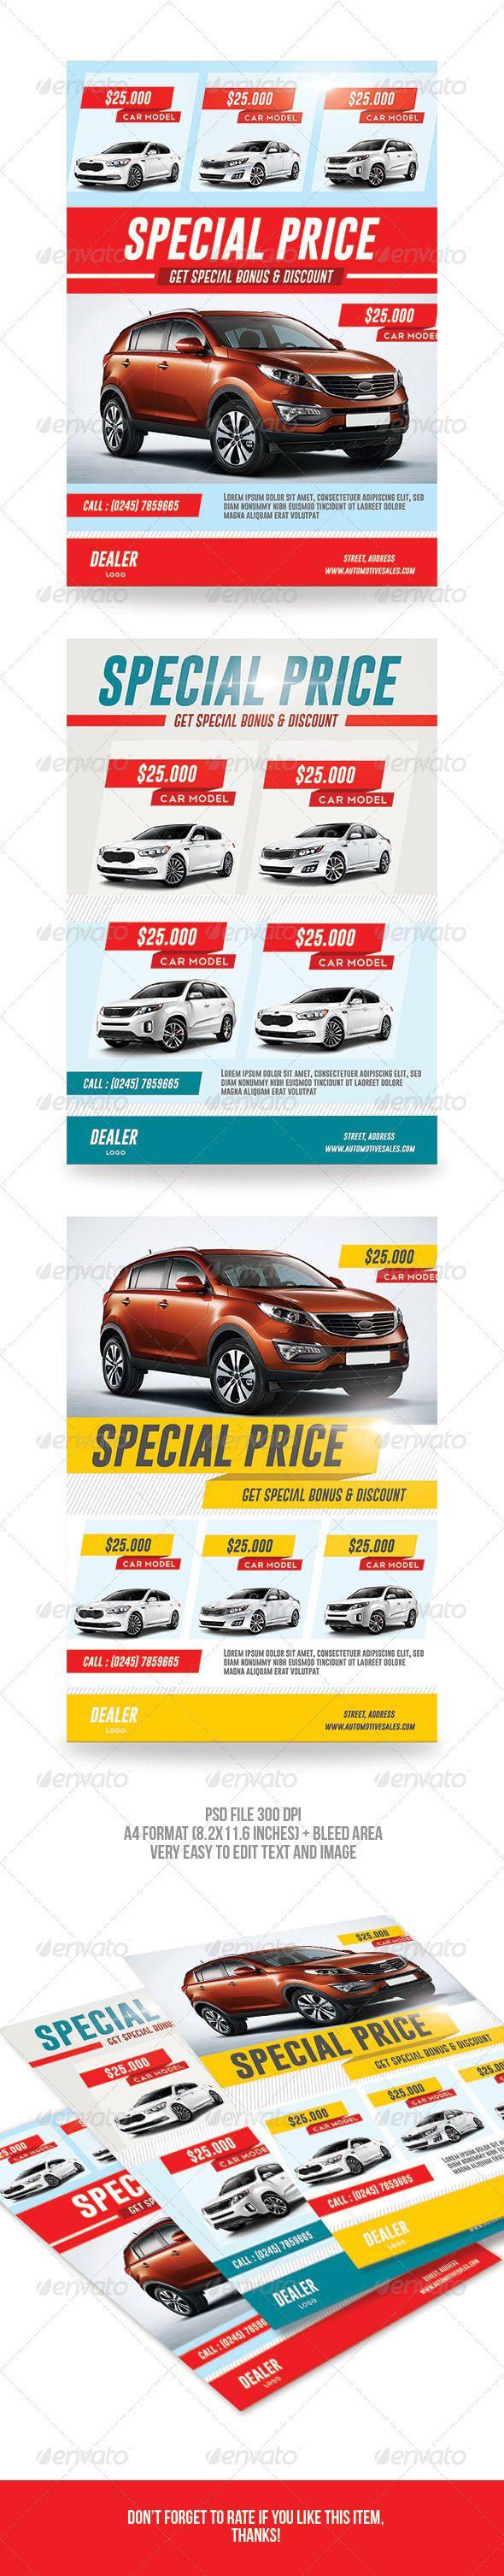 Car Sale Flyer - Corporate Flyers